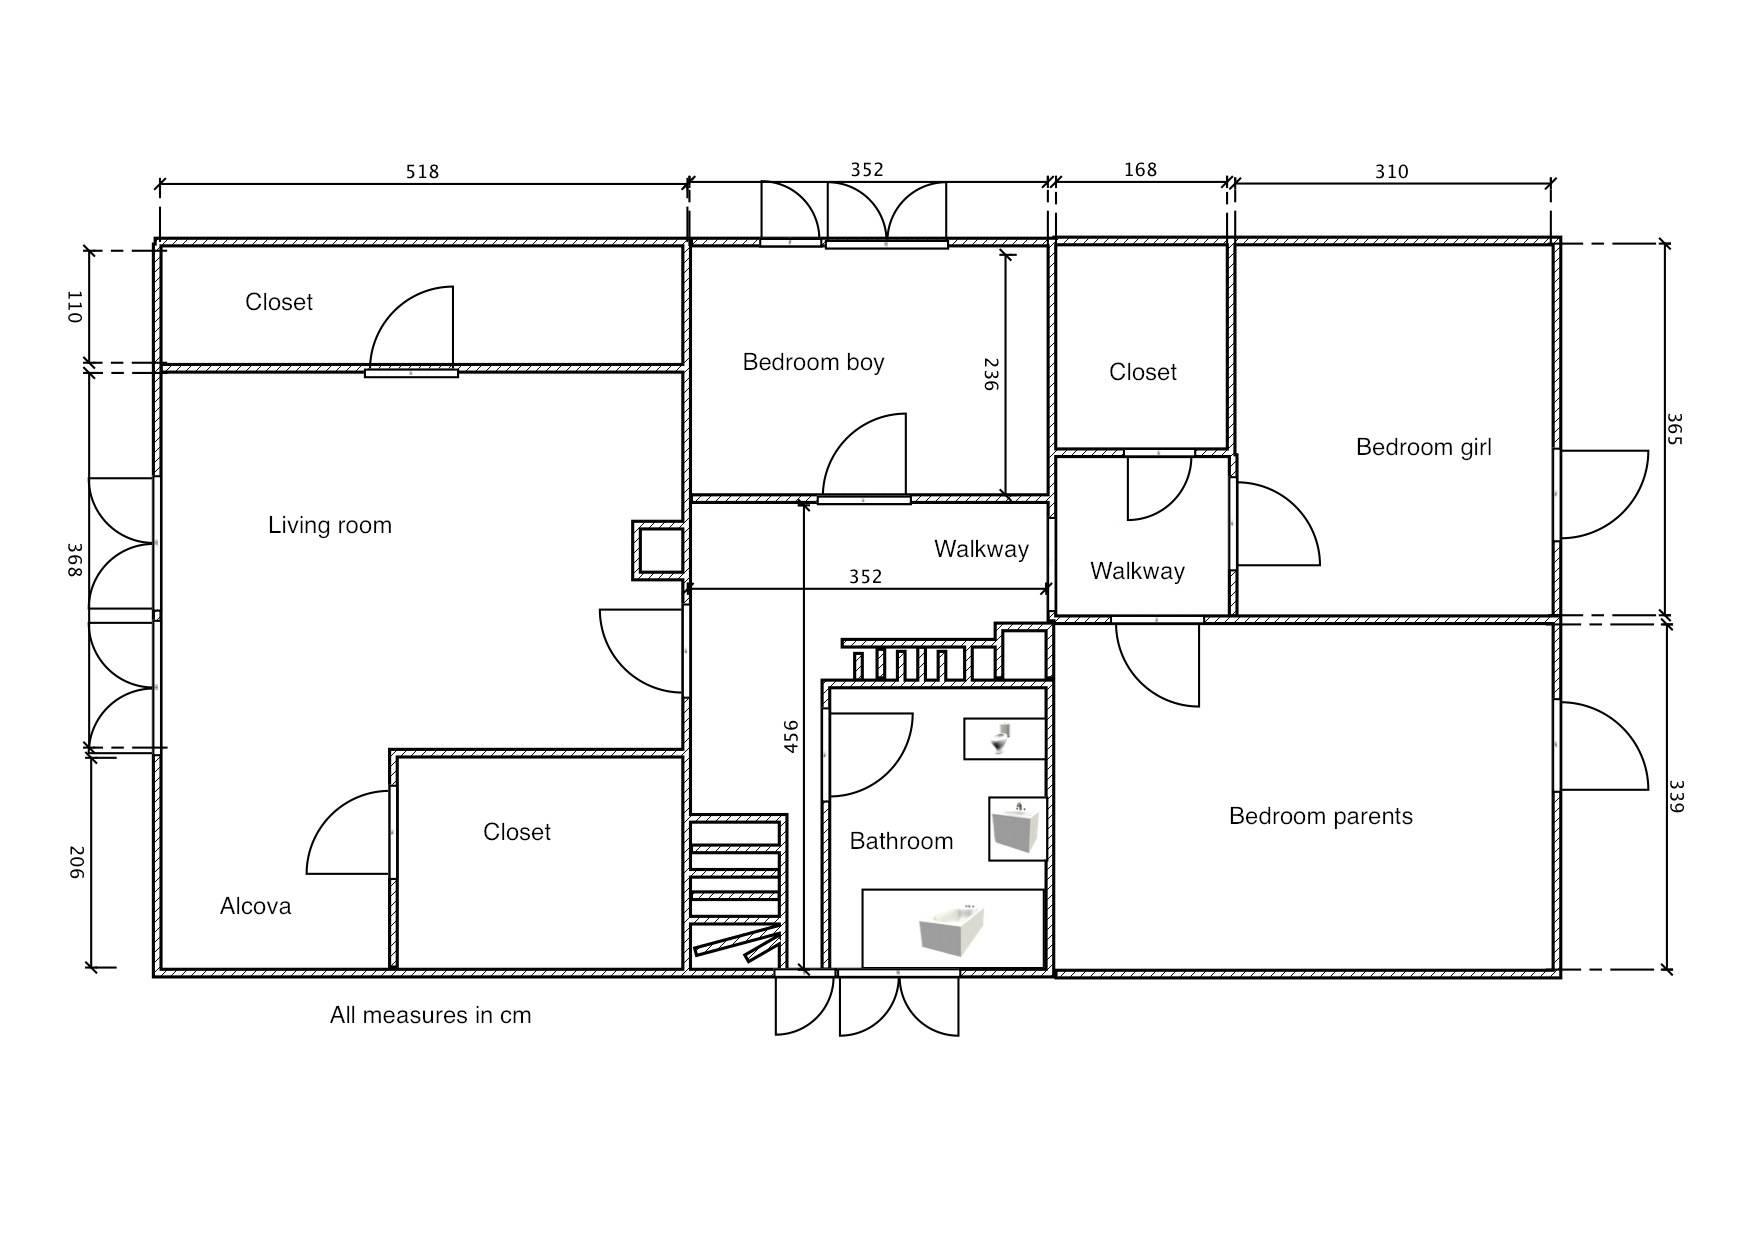 floor plans architecture yaz90 interesting floor plans architecture plan farm house plans 67206